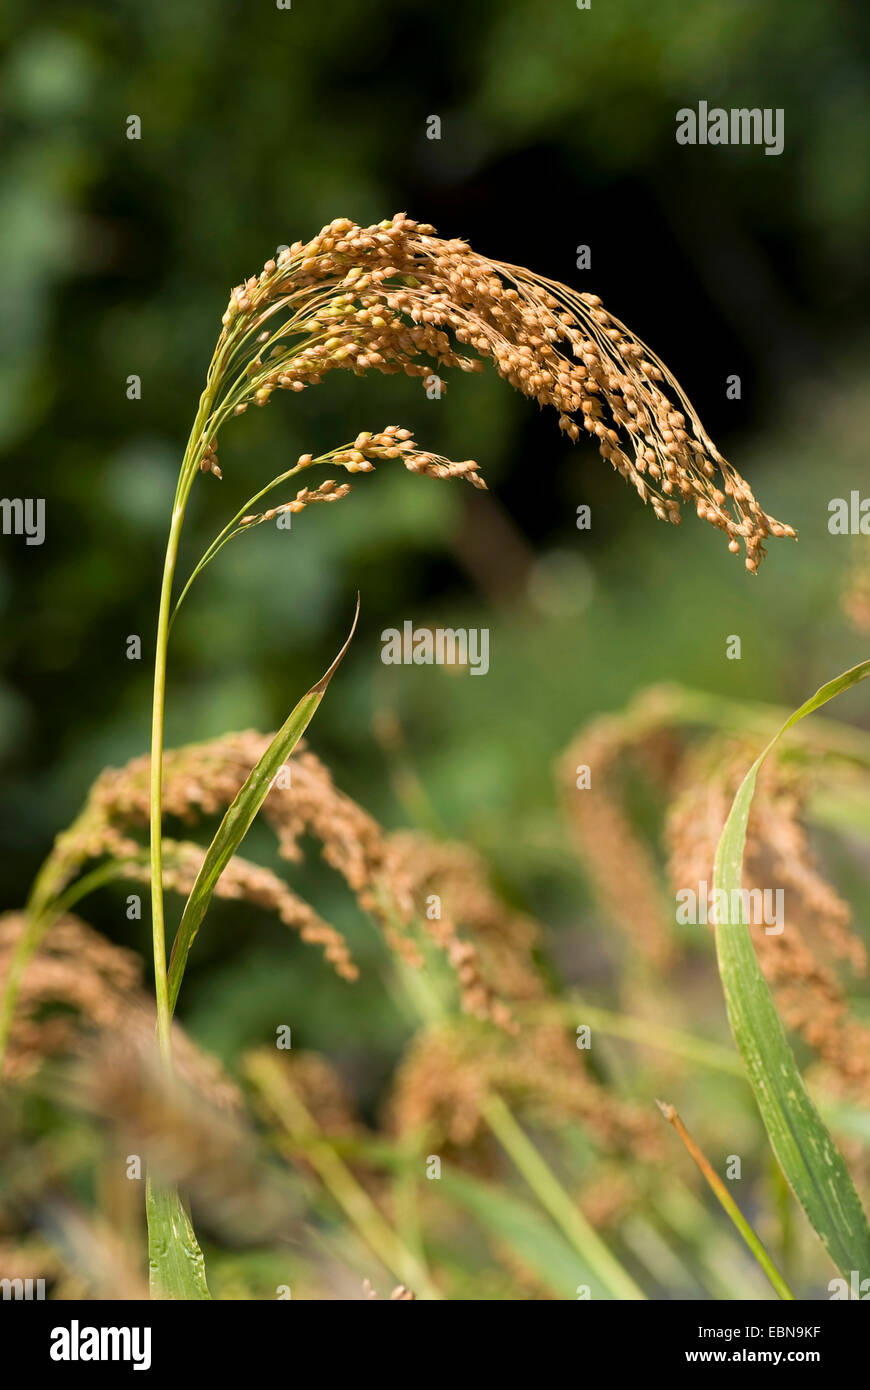 Le millet commun, millet, wild-panic millet (Panicum miliaceum), panicule Photo Stock